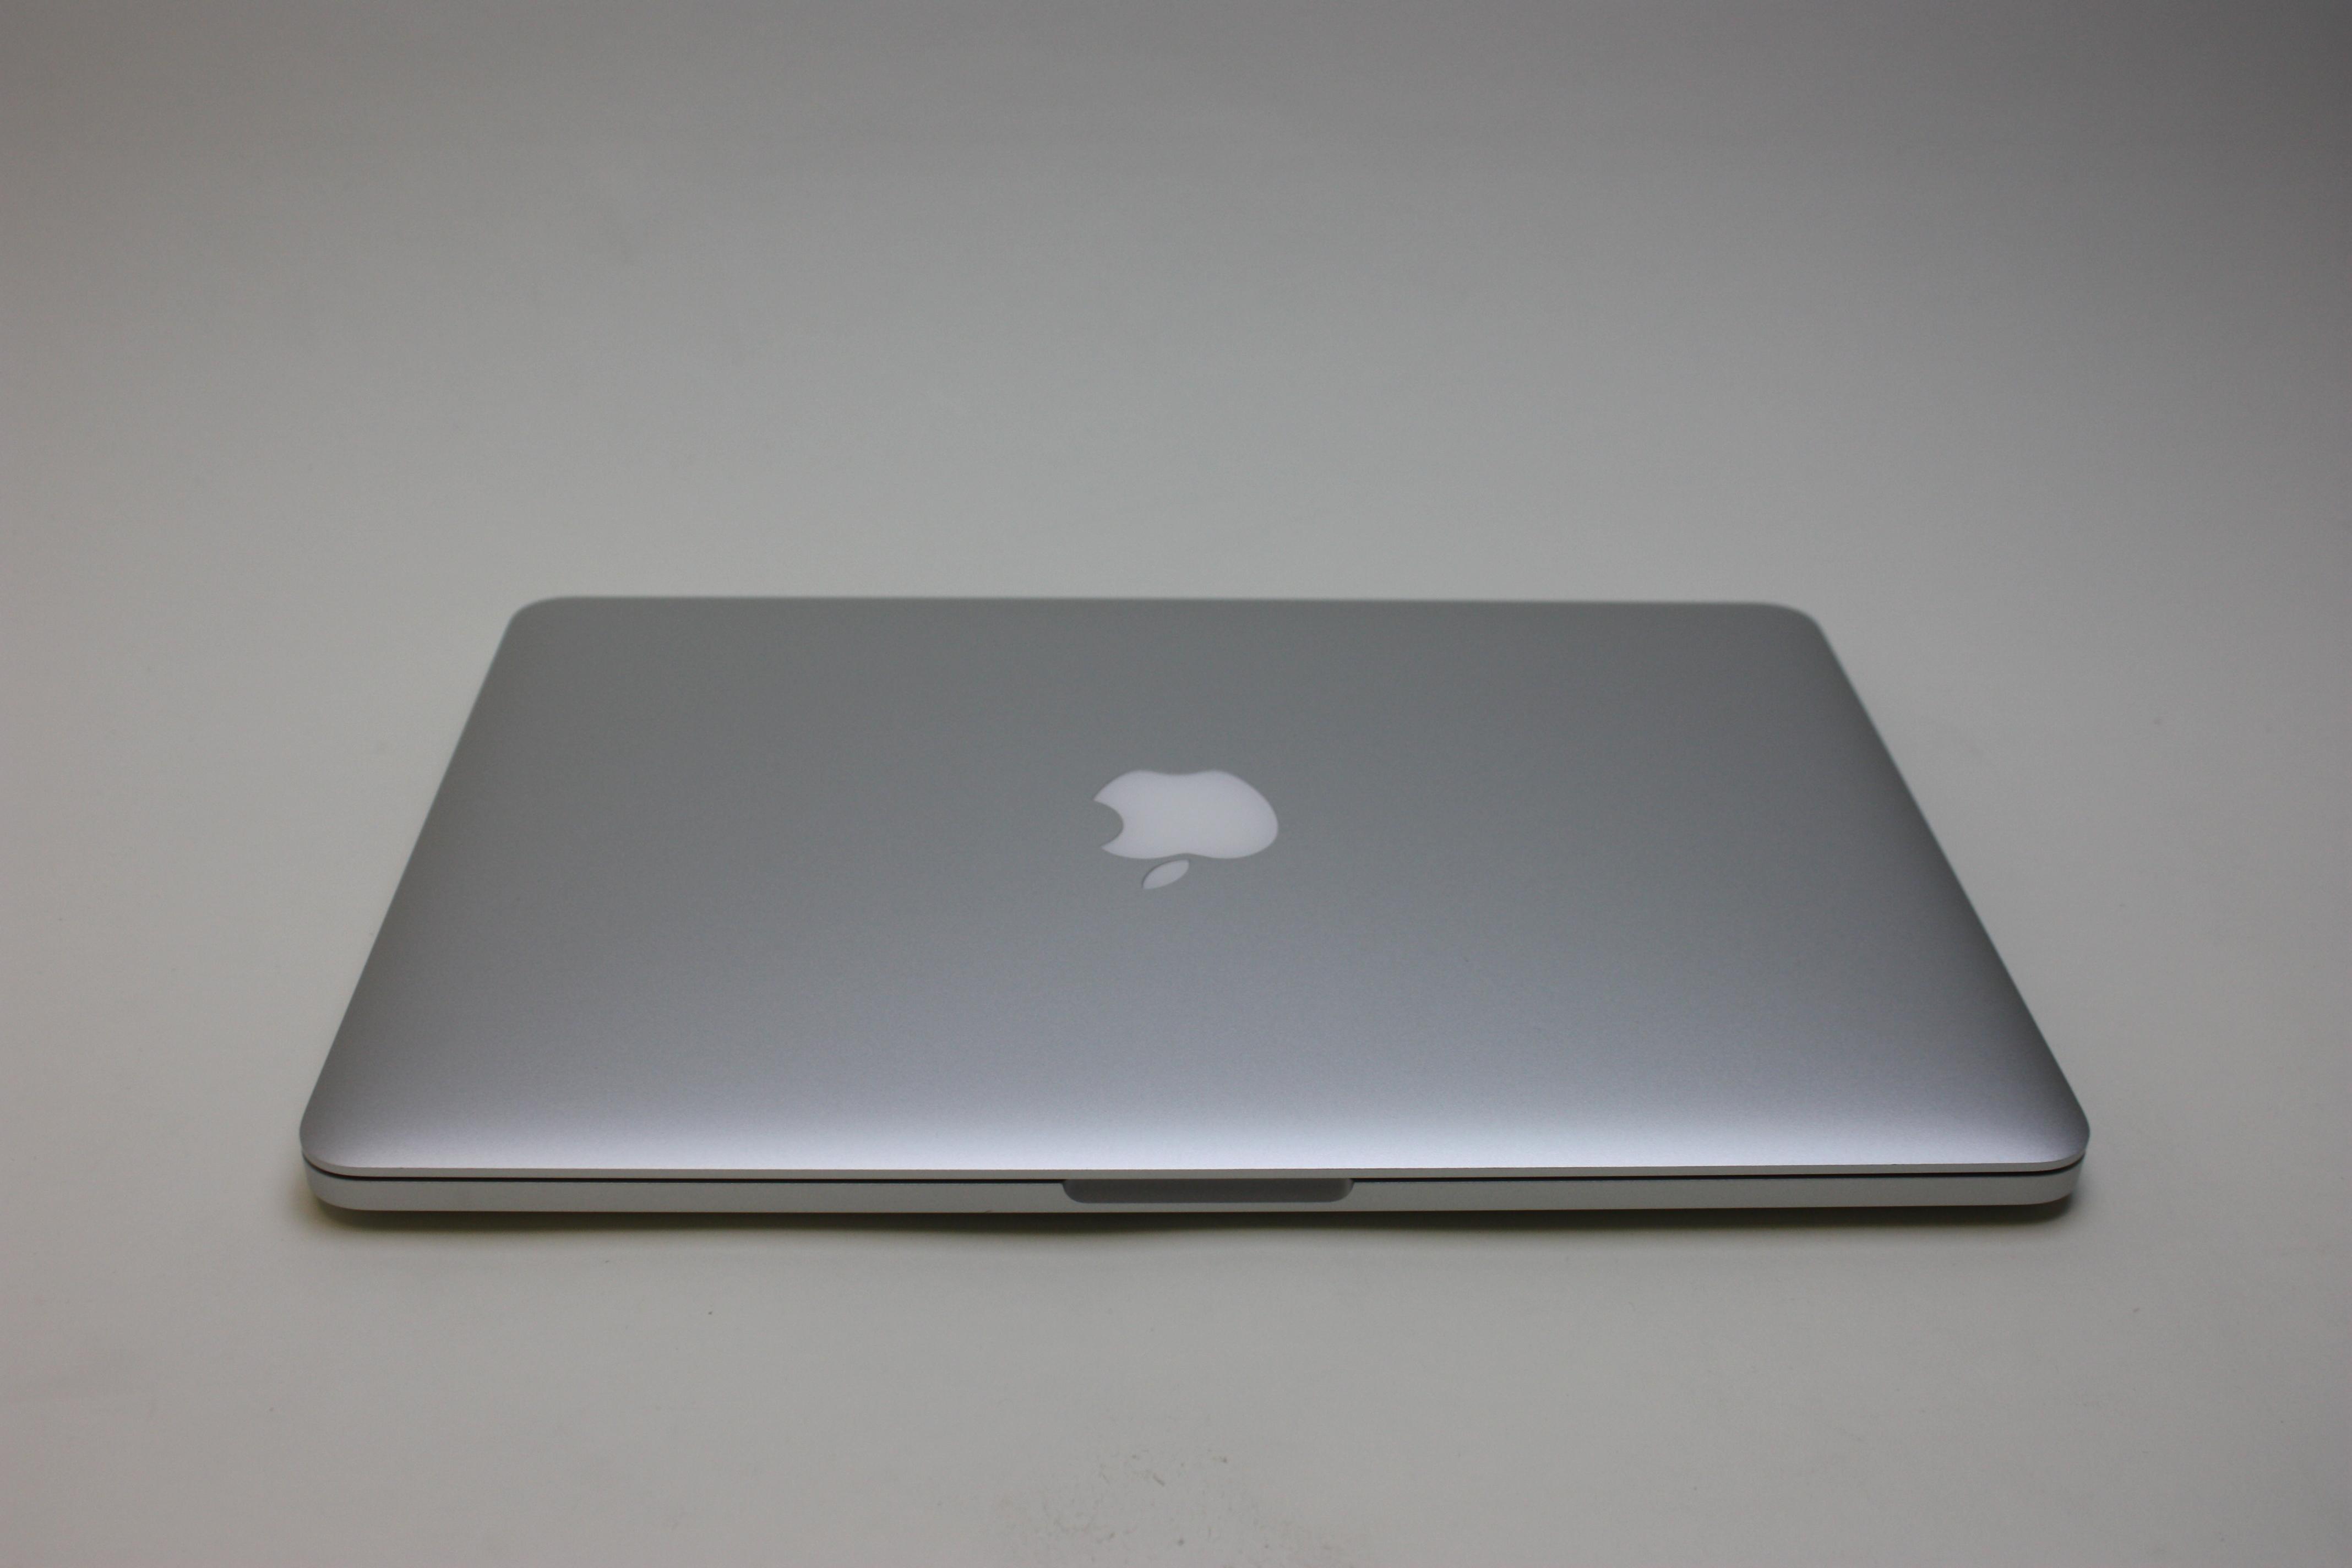 MacBook Pro 13-inch Retina, 2.7 GHz Core i5 (I5-5257U), 8 GB 1867 MHz DDR3, 128 GB Flash Storage, image 4